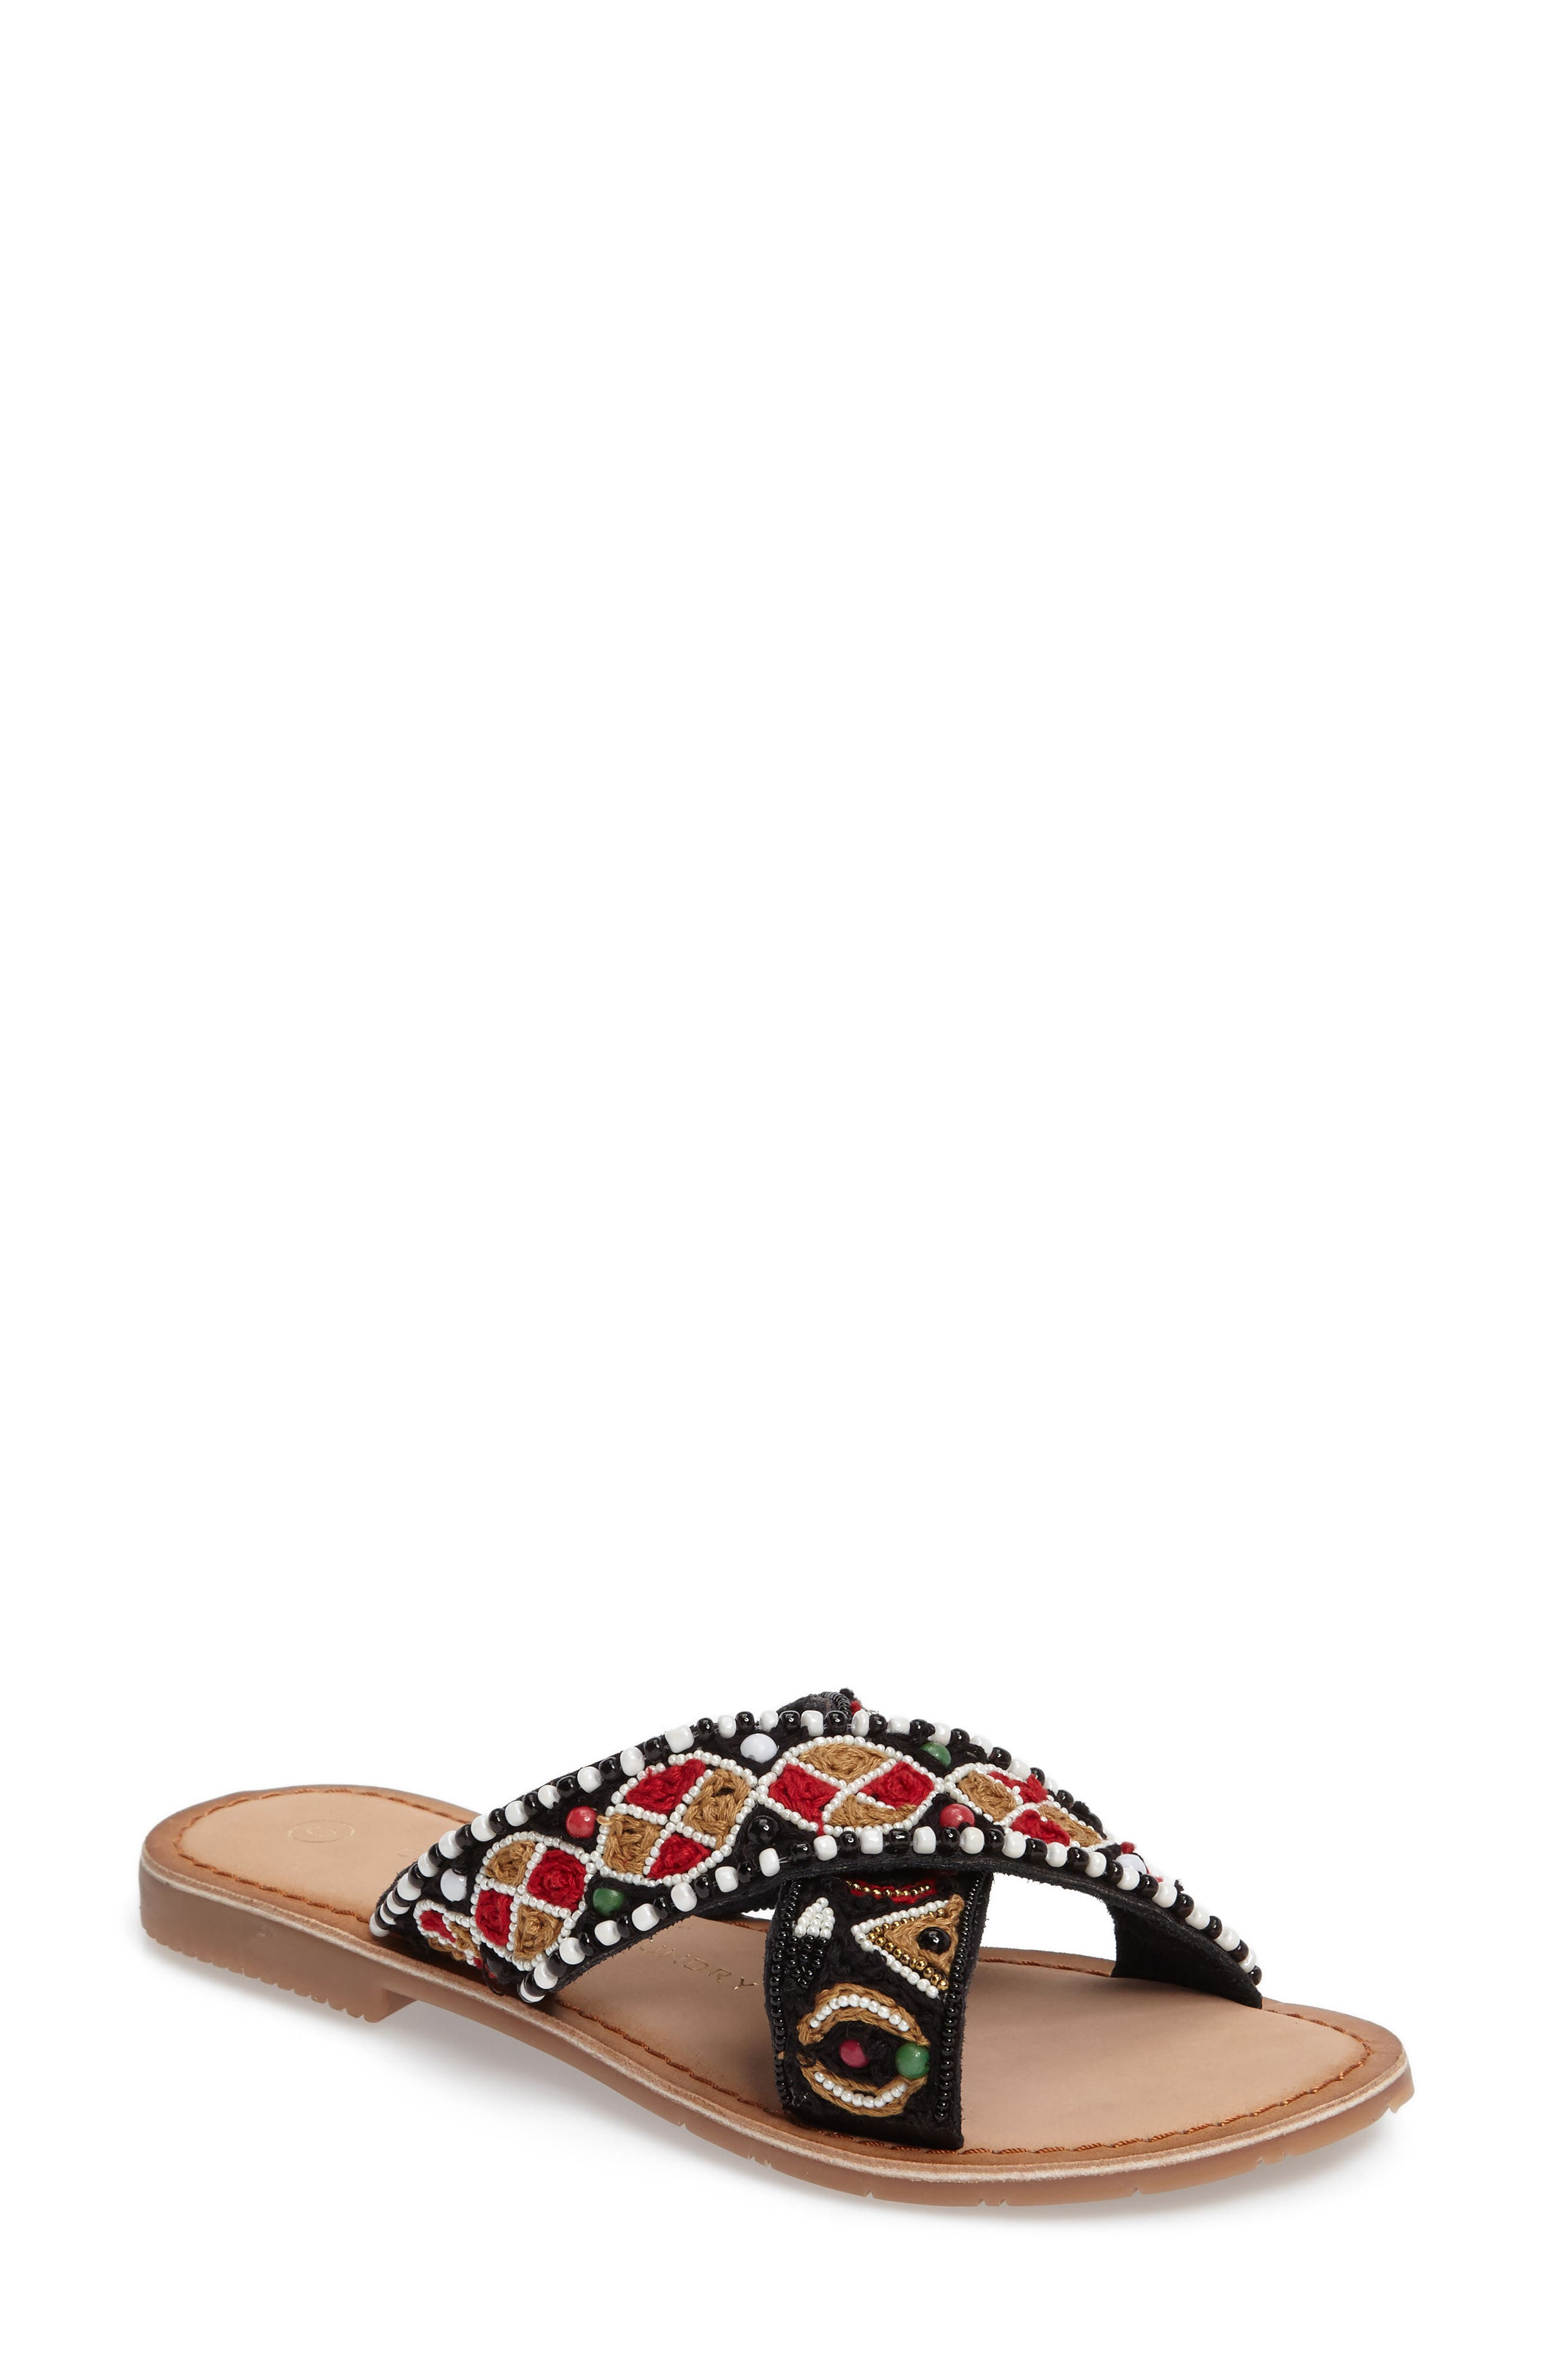 CHINESE LAUNDRY Purfect Slide Sandal